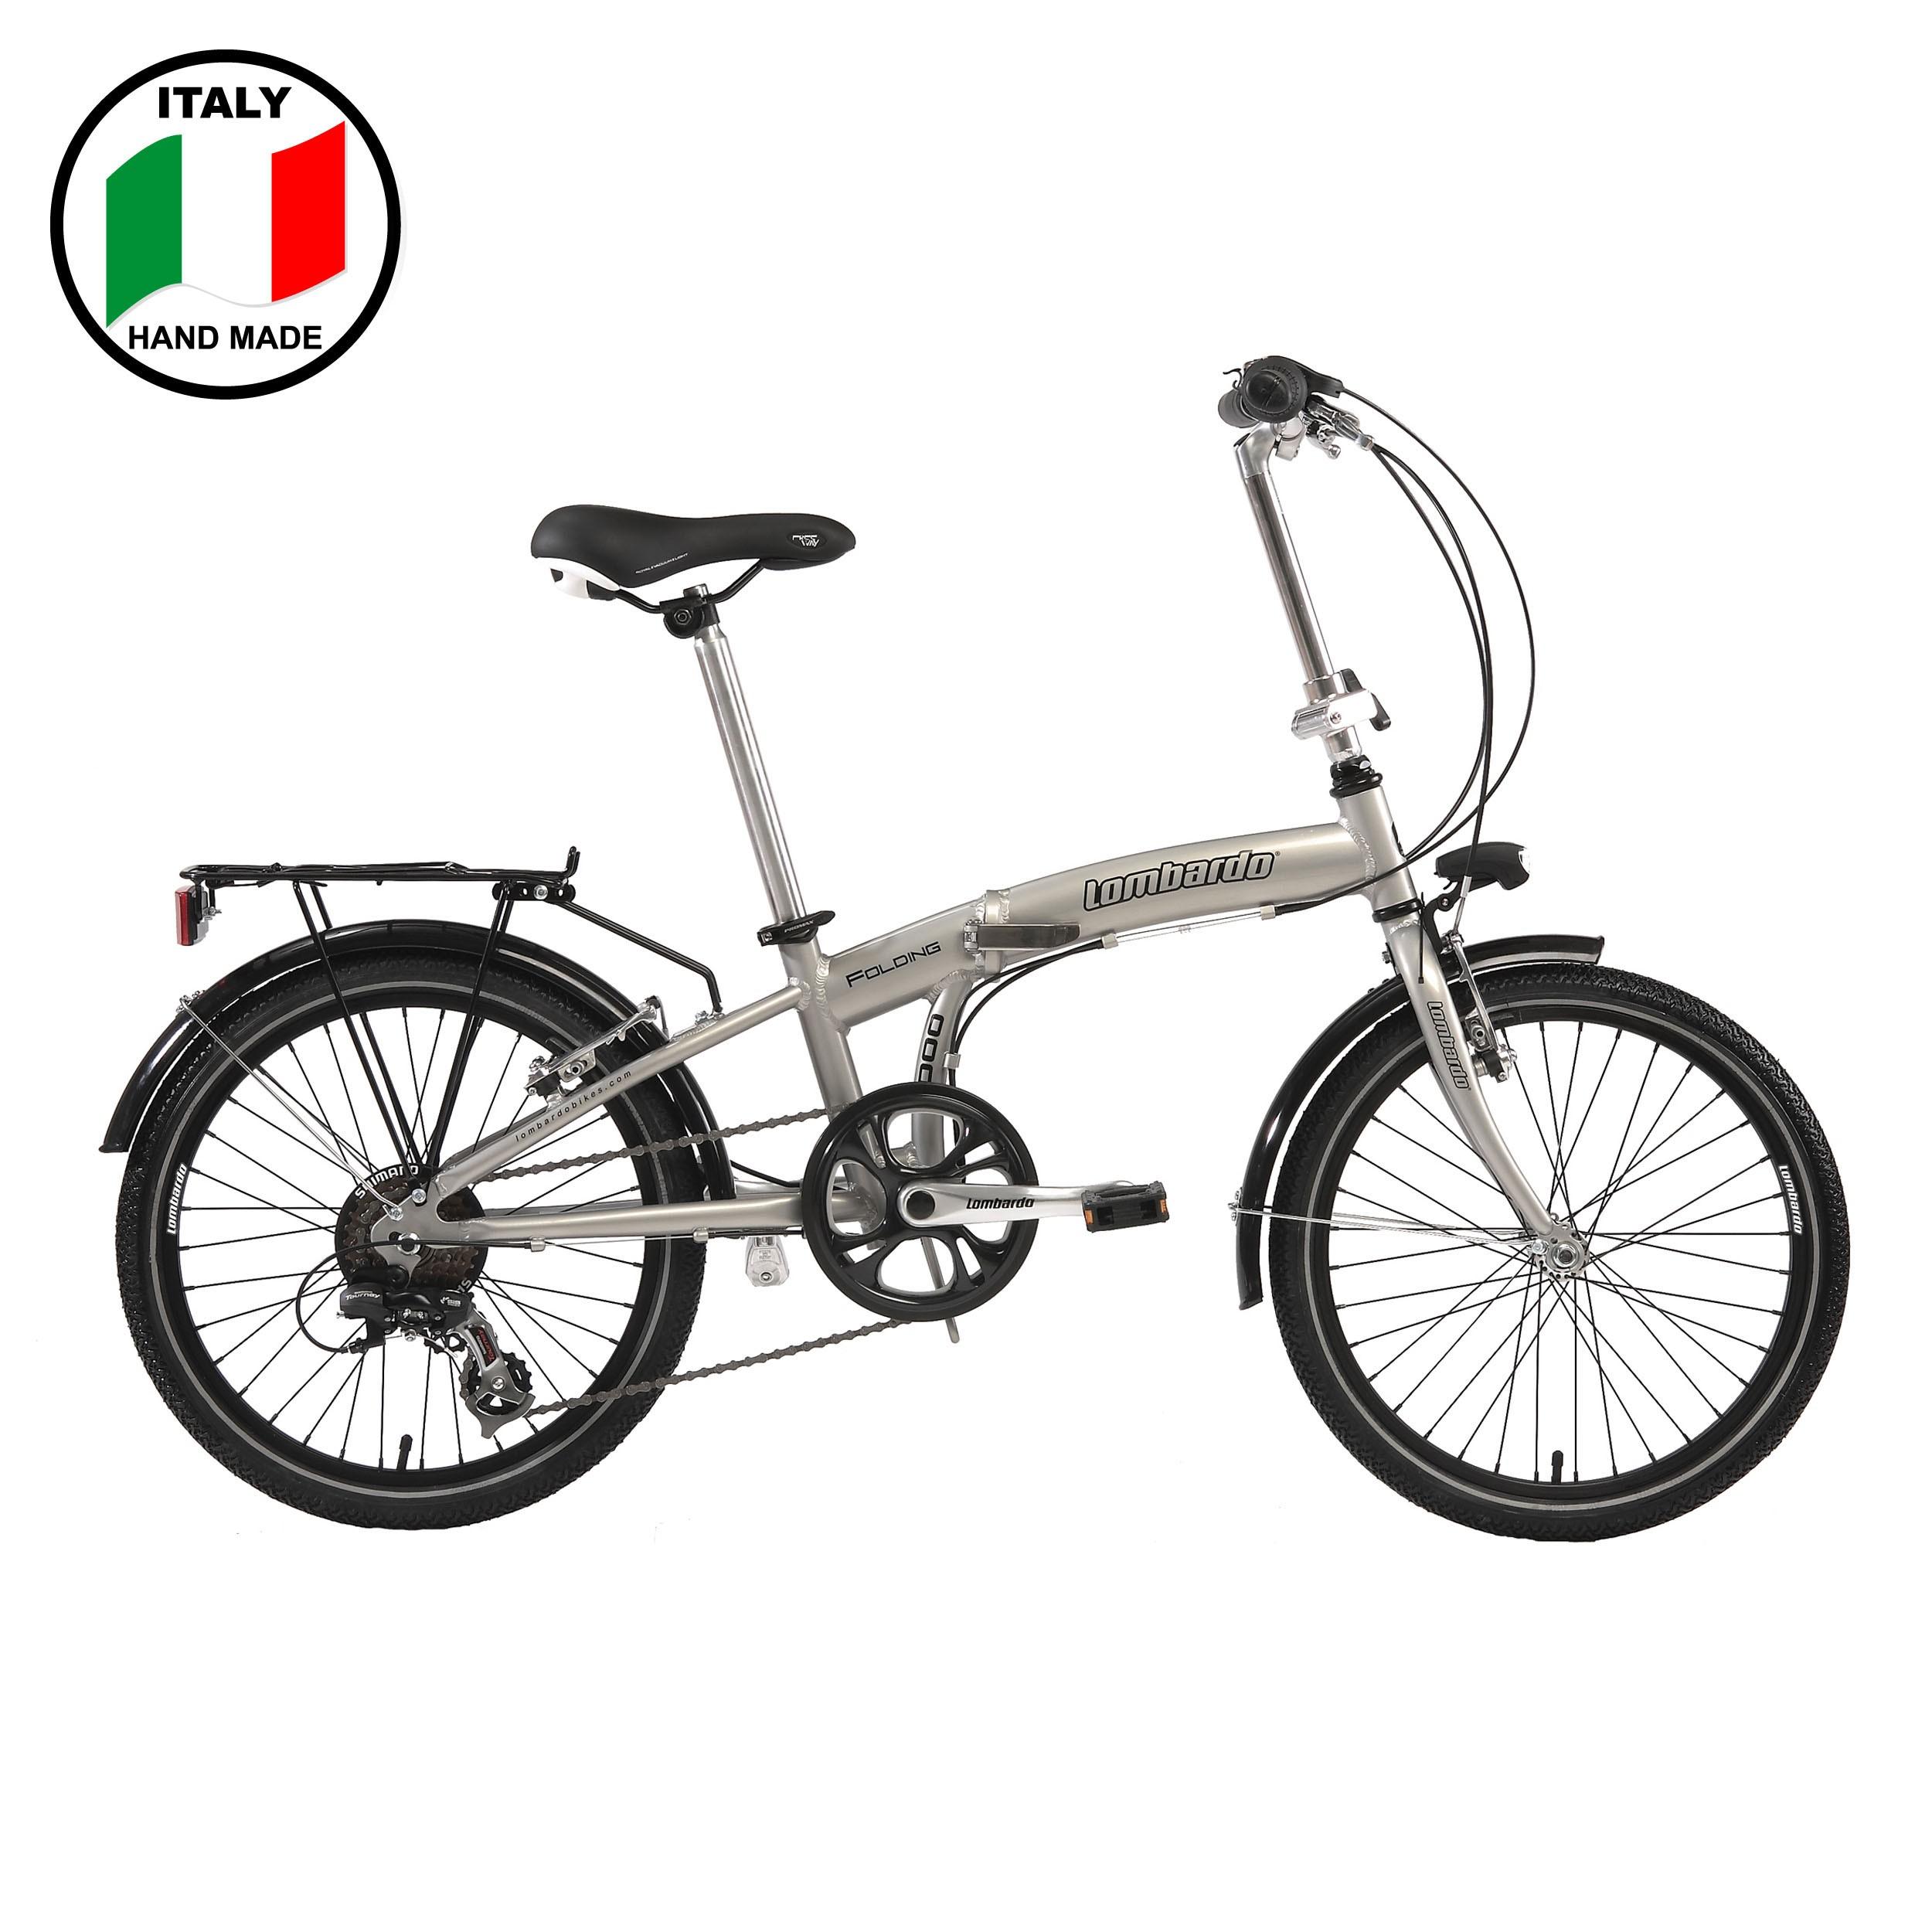 Lombardo Folding 3000 20 inch Bike- Silver